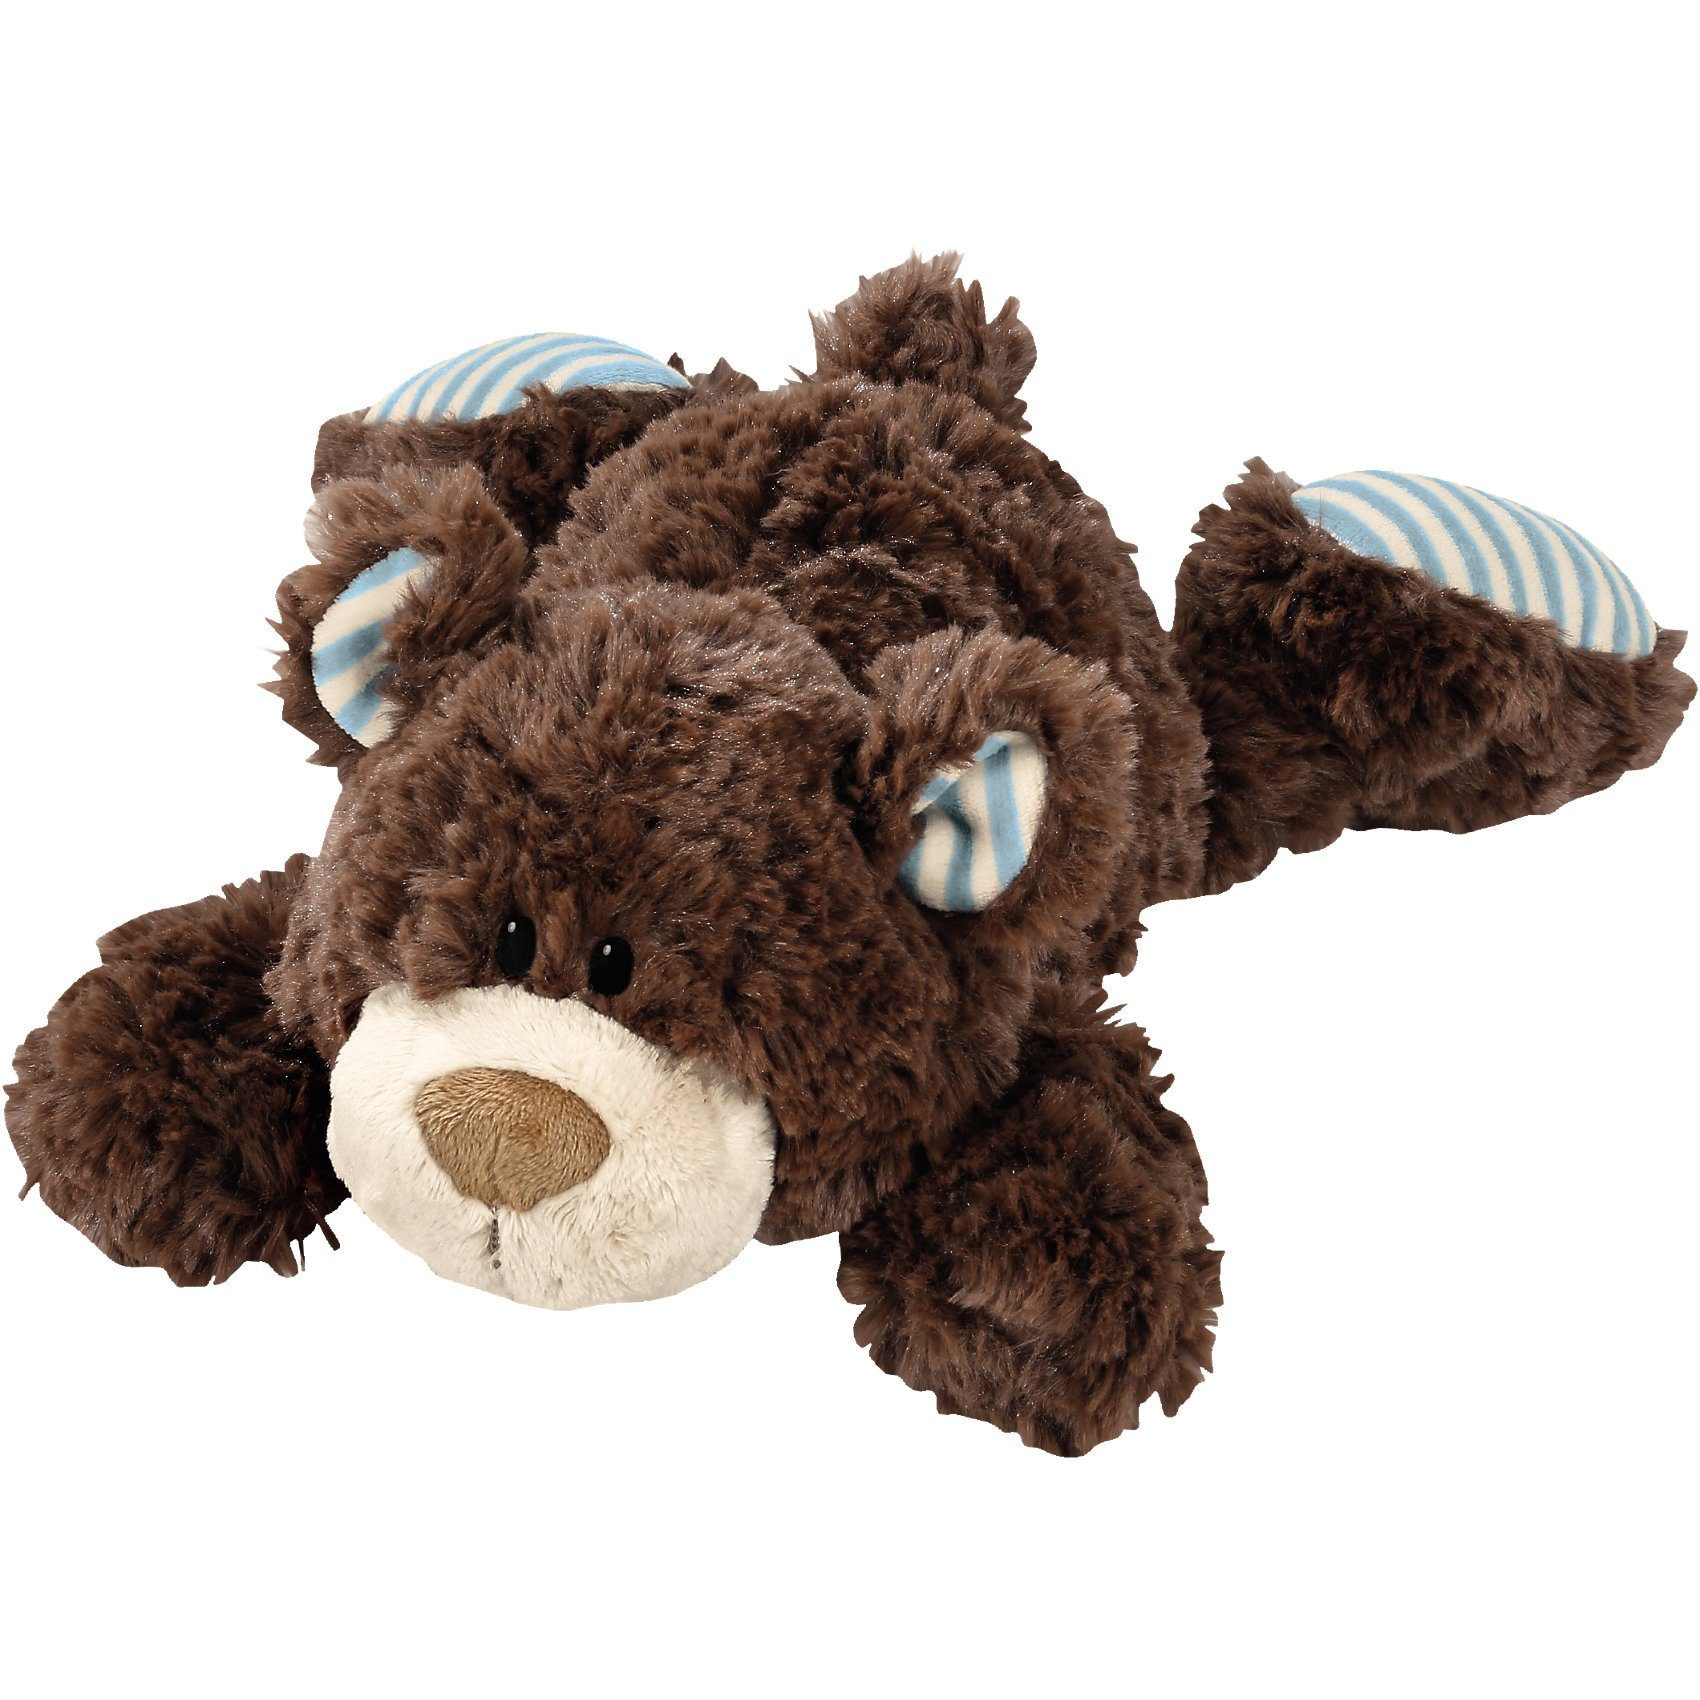 NICI Bär liegend 30cm (38155)